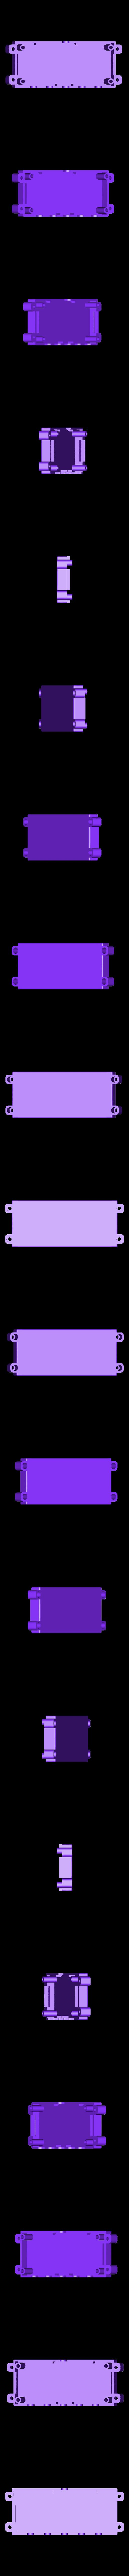 MV_AMC_Upper_Case.stl Download free STL file Case for myVolts passive mixer • 3D printable template, PapaBravo